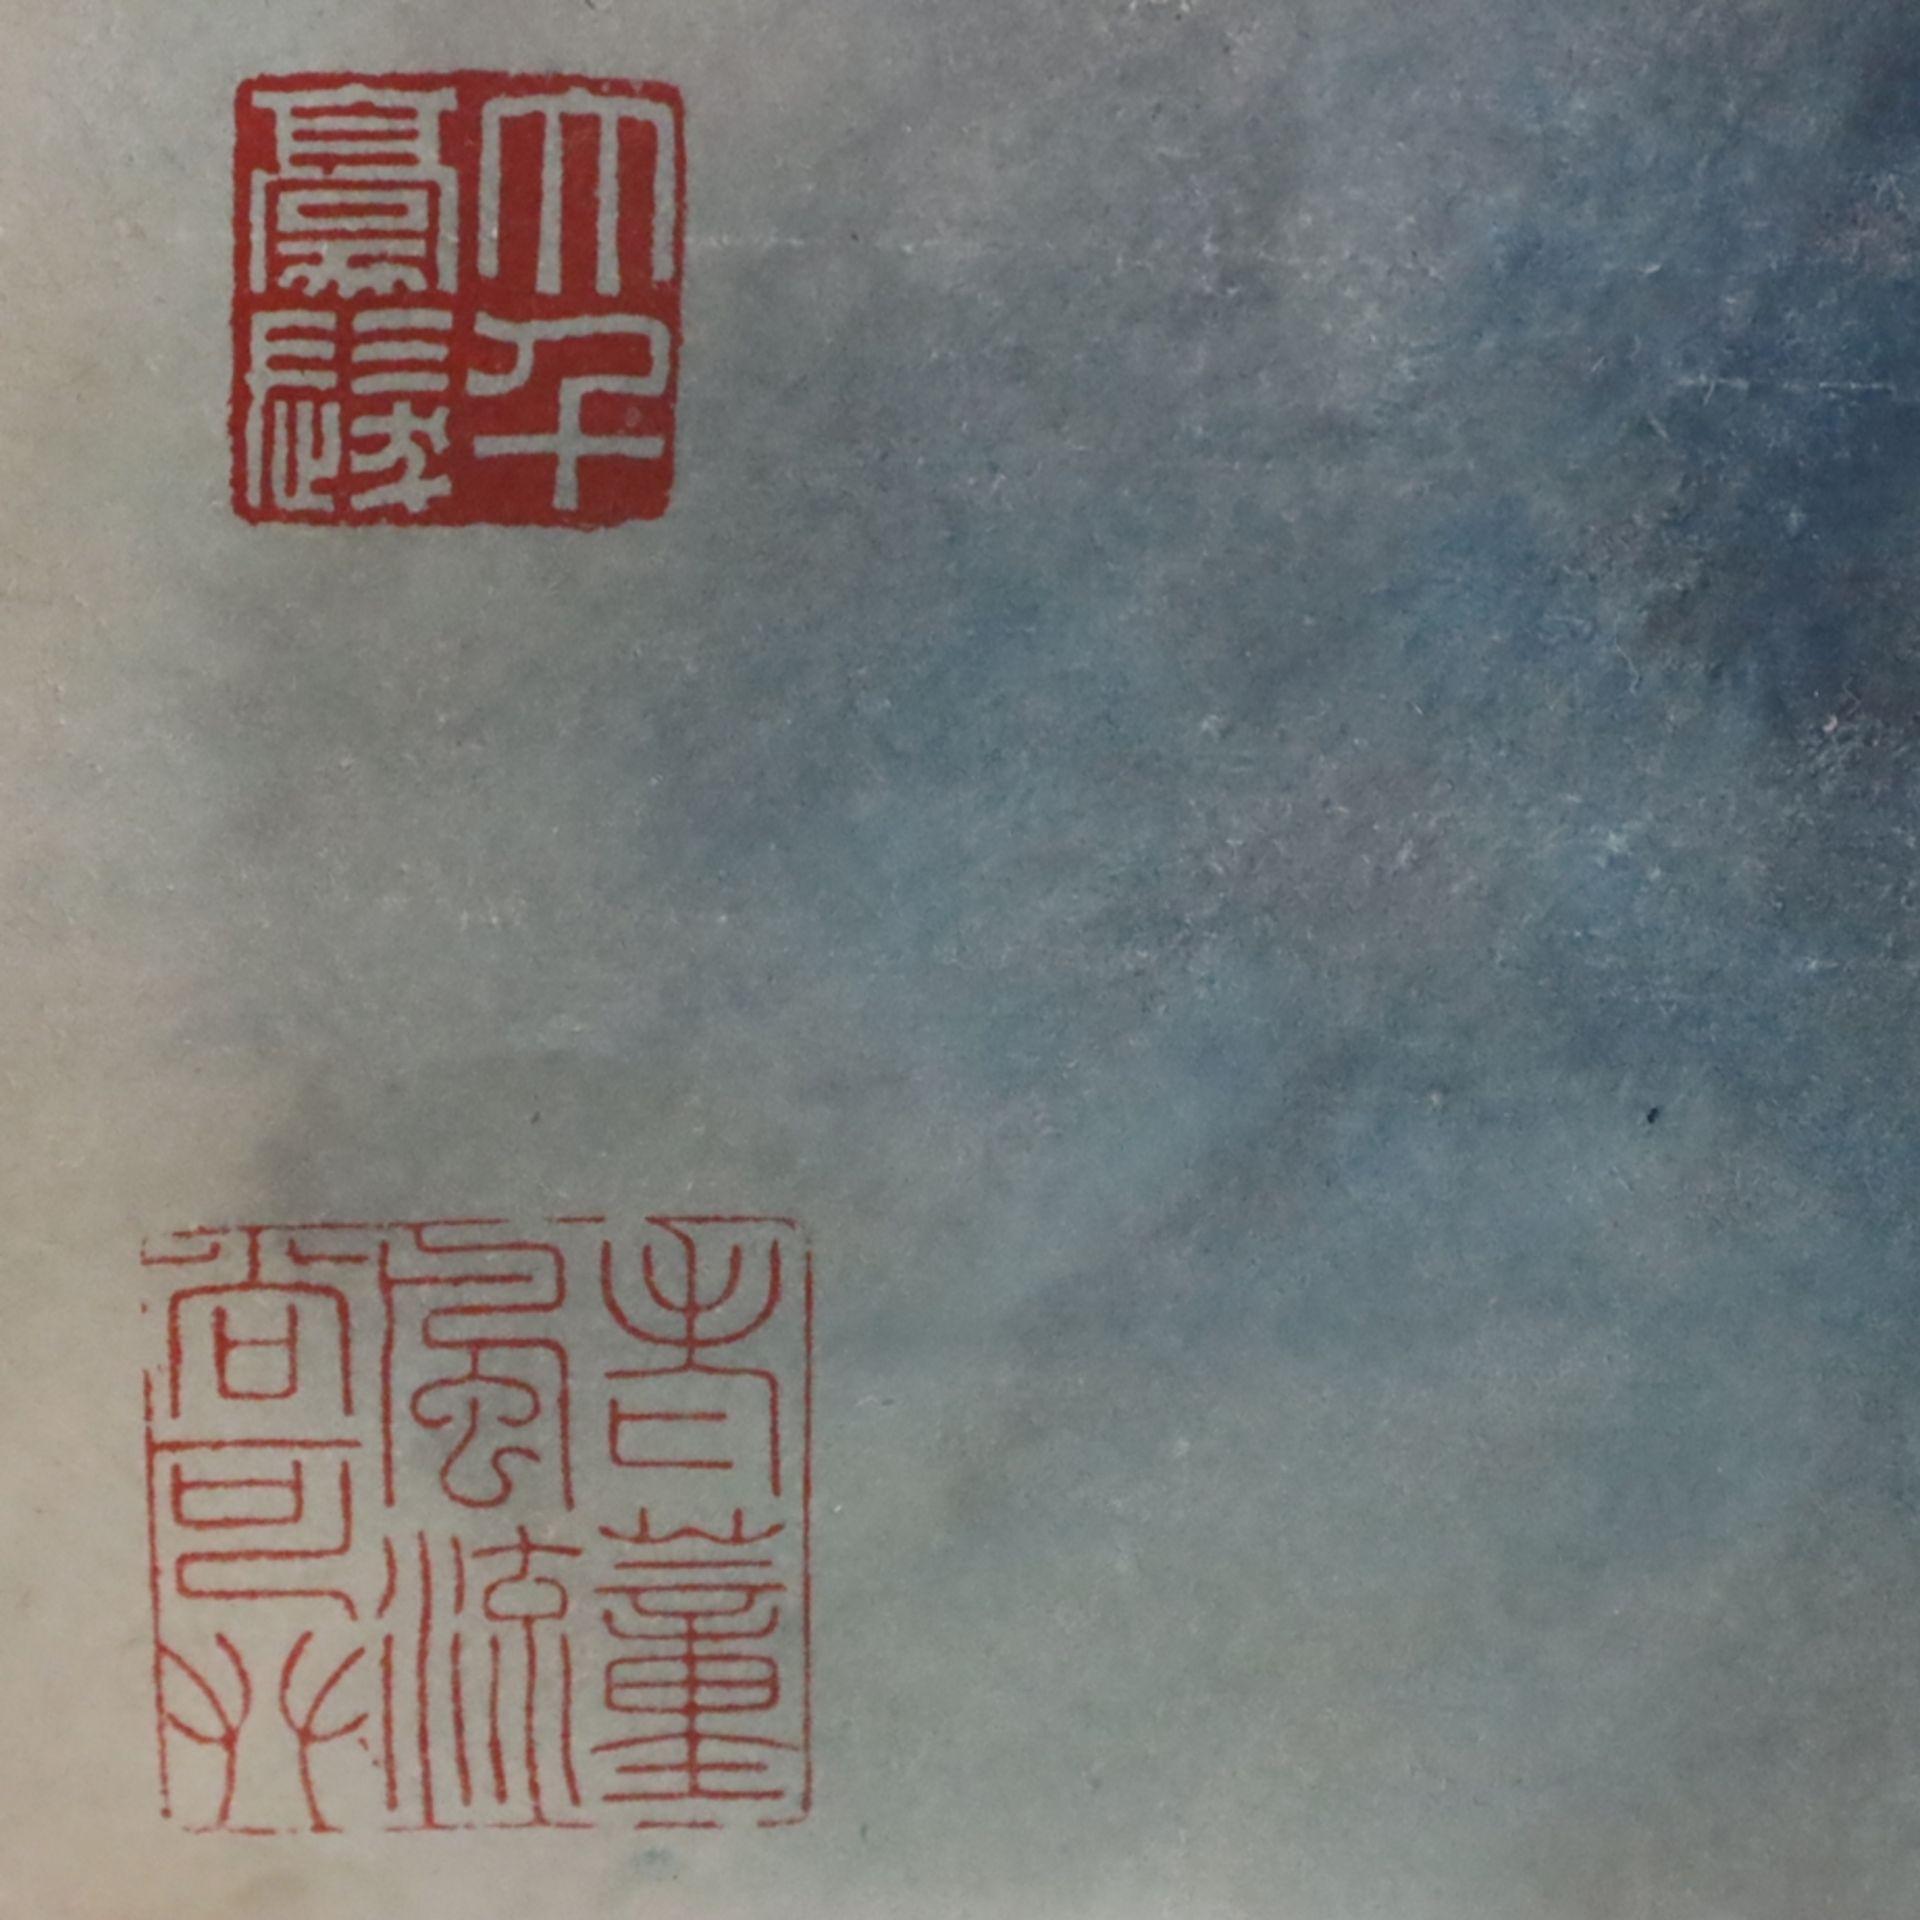 Chinesisches Rollbild - gesiegelt Zhang Daqian (   Chinese Hanging Scroll - sealed Zhang Daqian (18 - Image 16 of 18